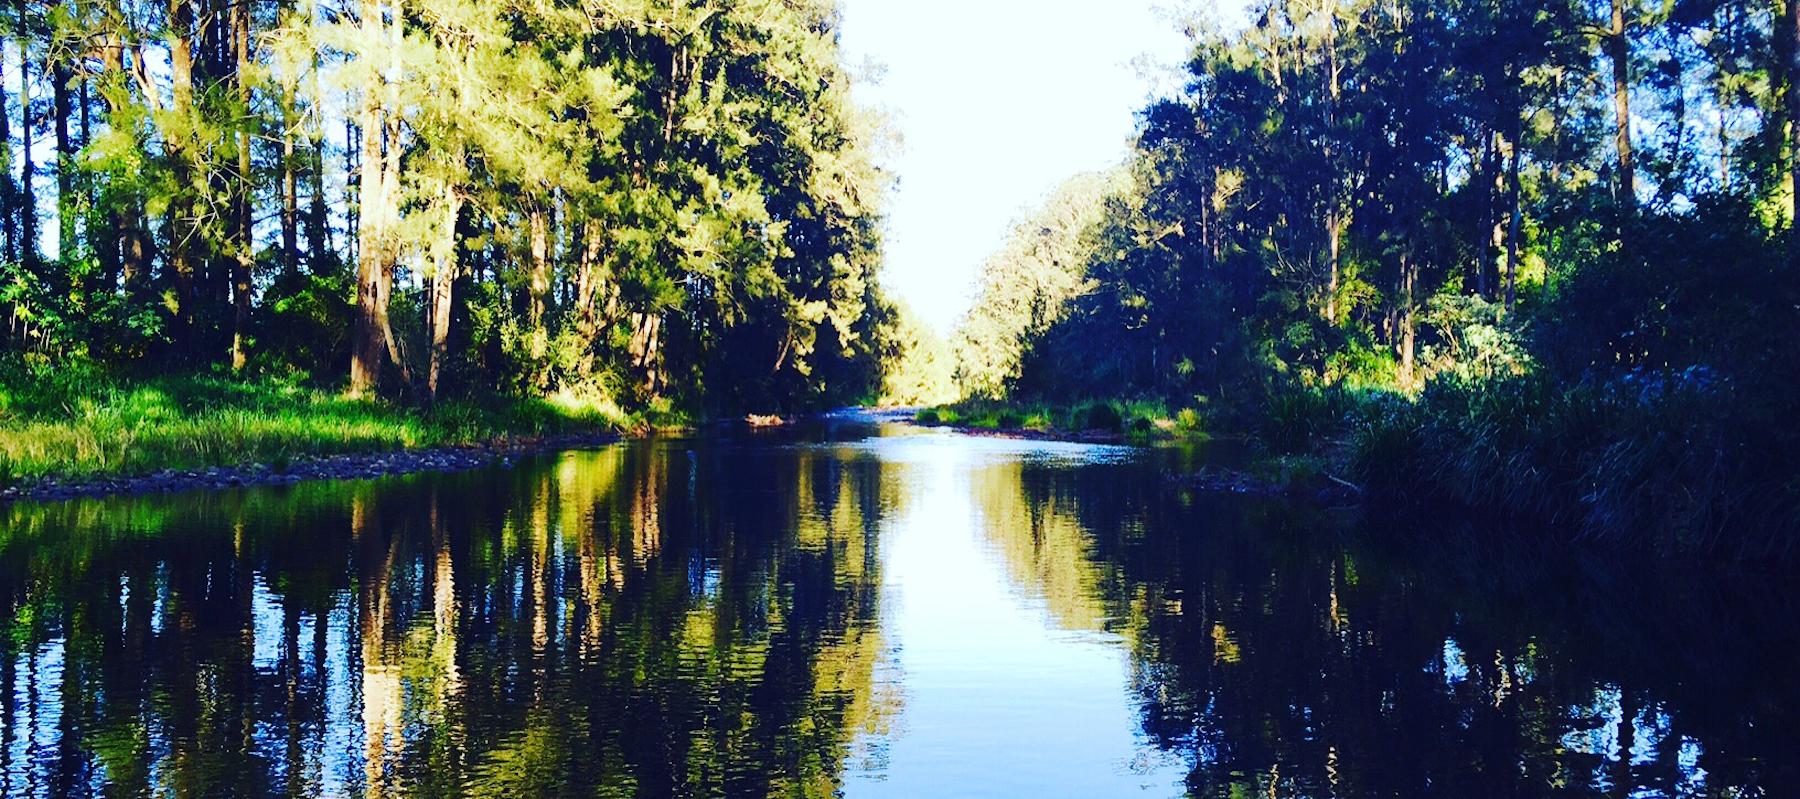 bellingen accommodation, bellingen location shoot, photo shoot, film shoot location, moo river farm, bellinger river, music video location